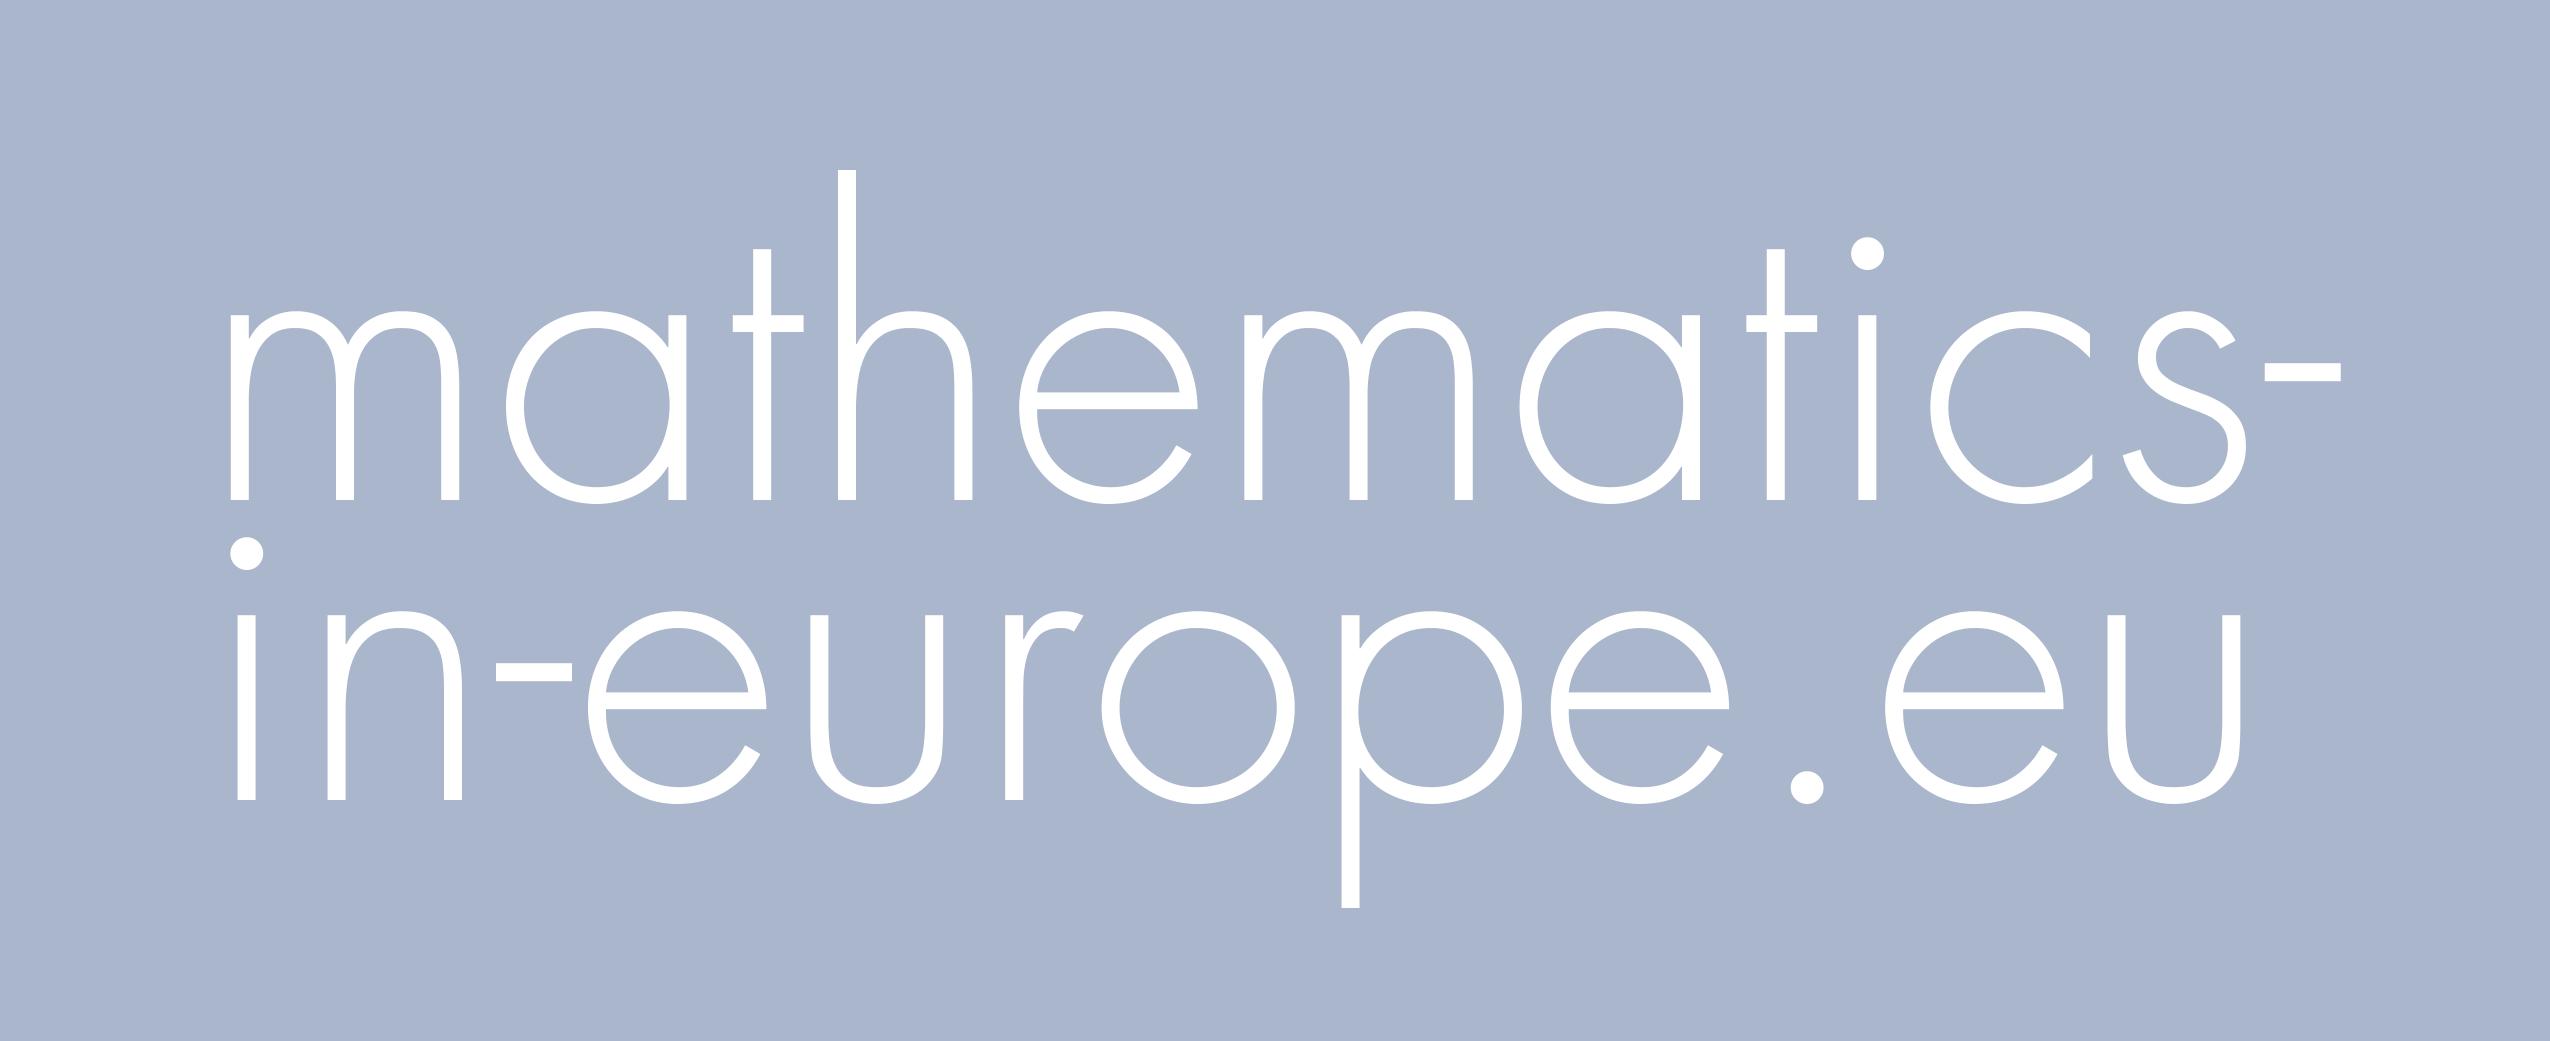 mathinEurope